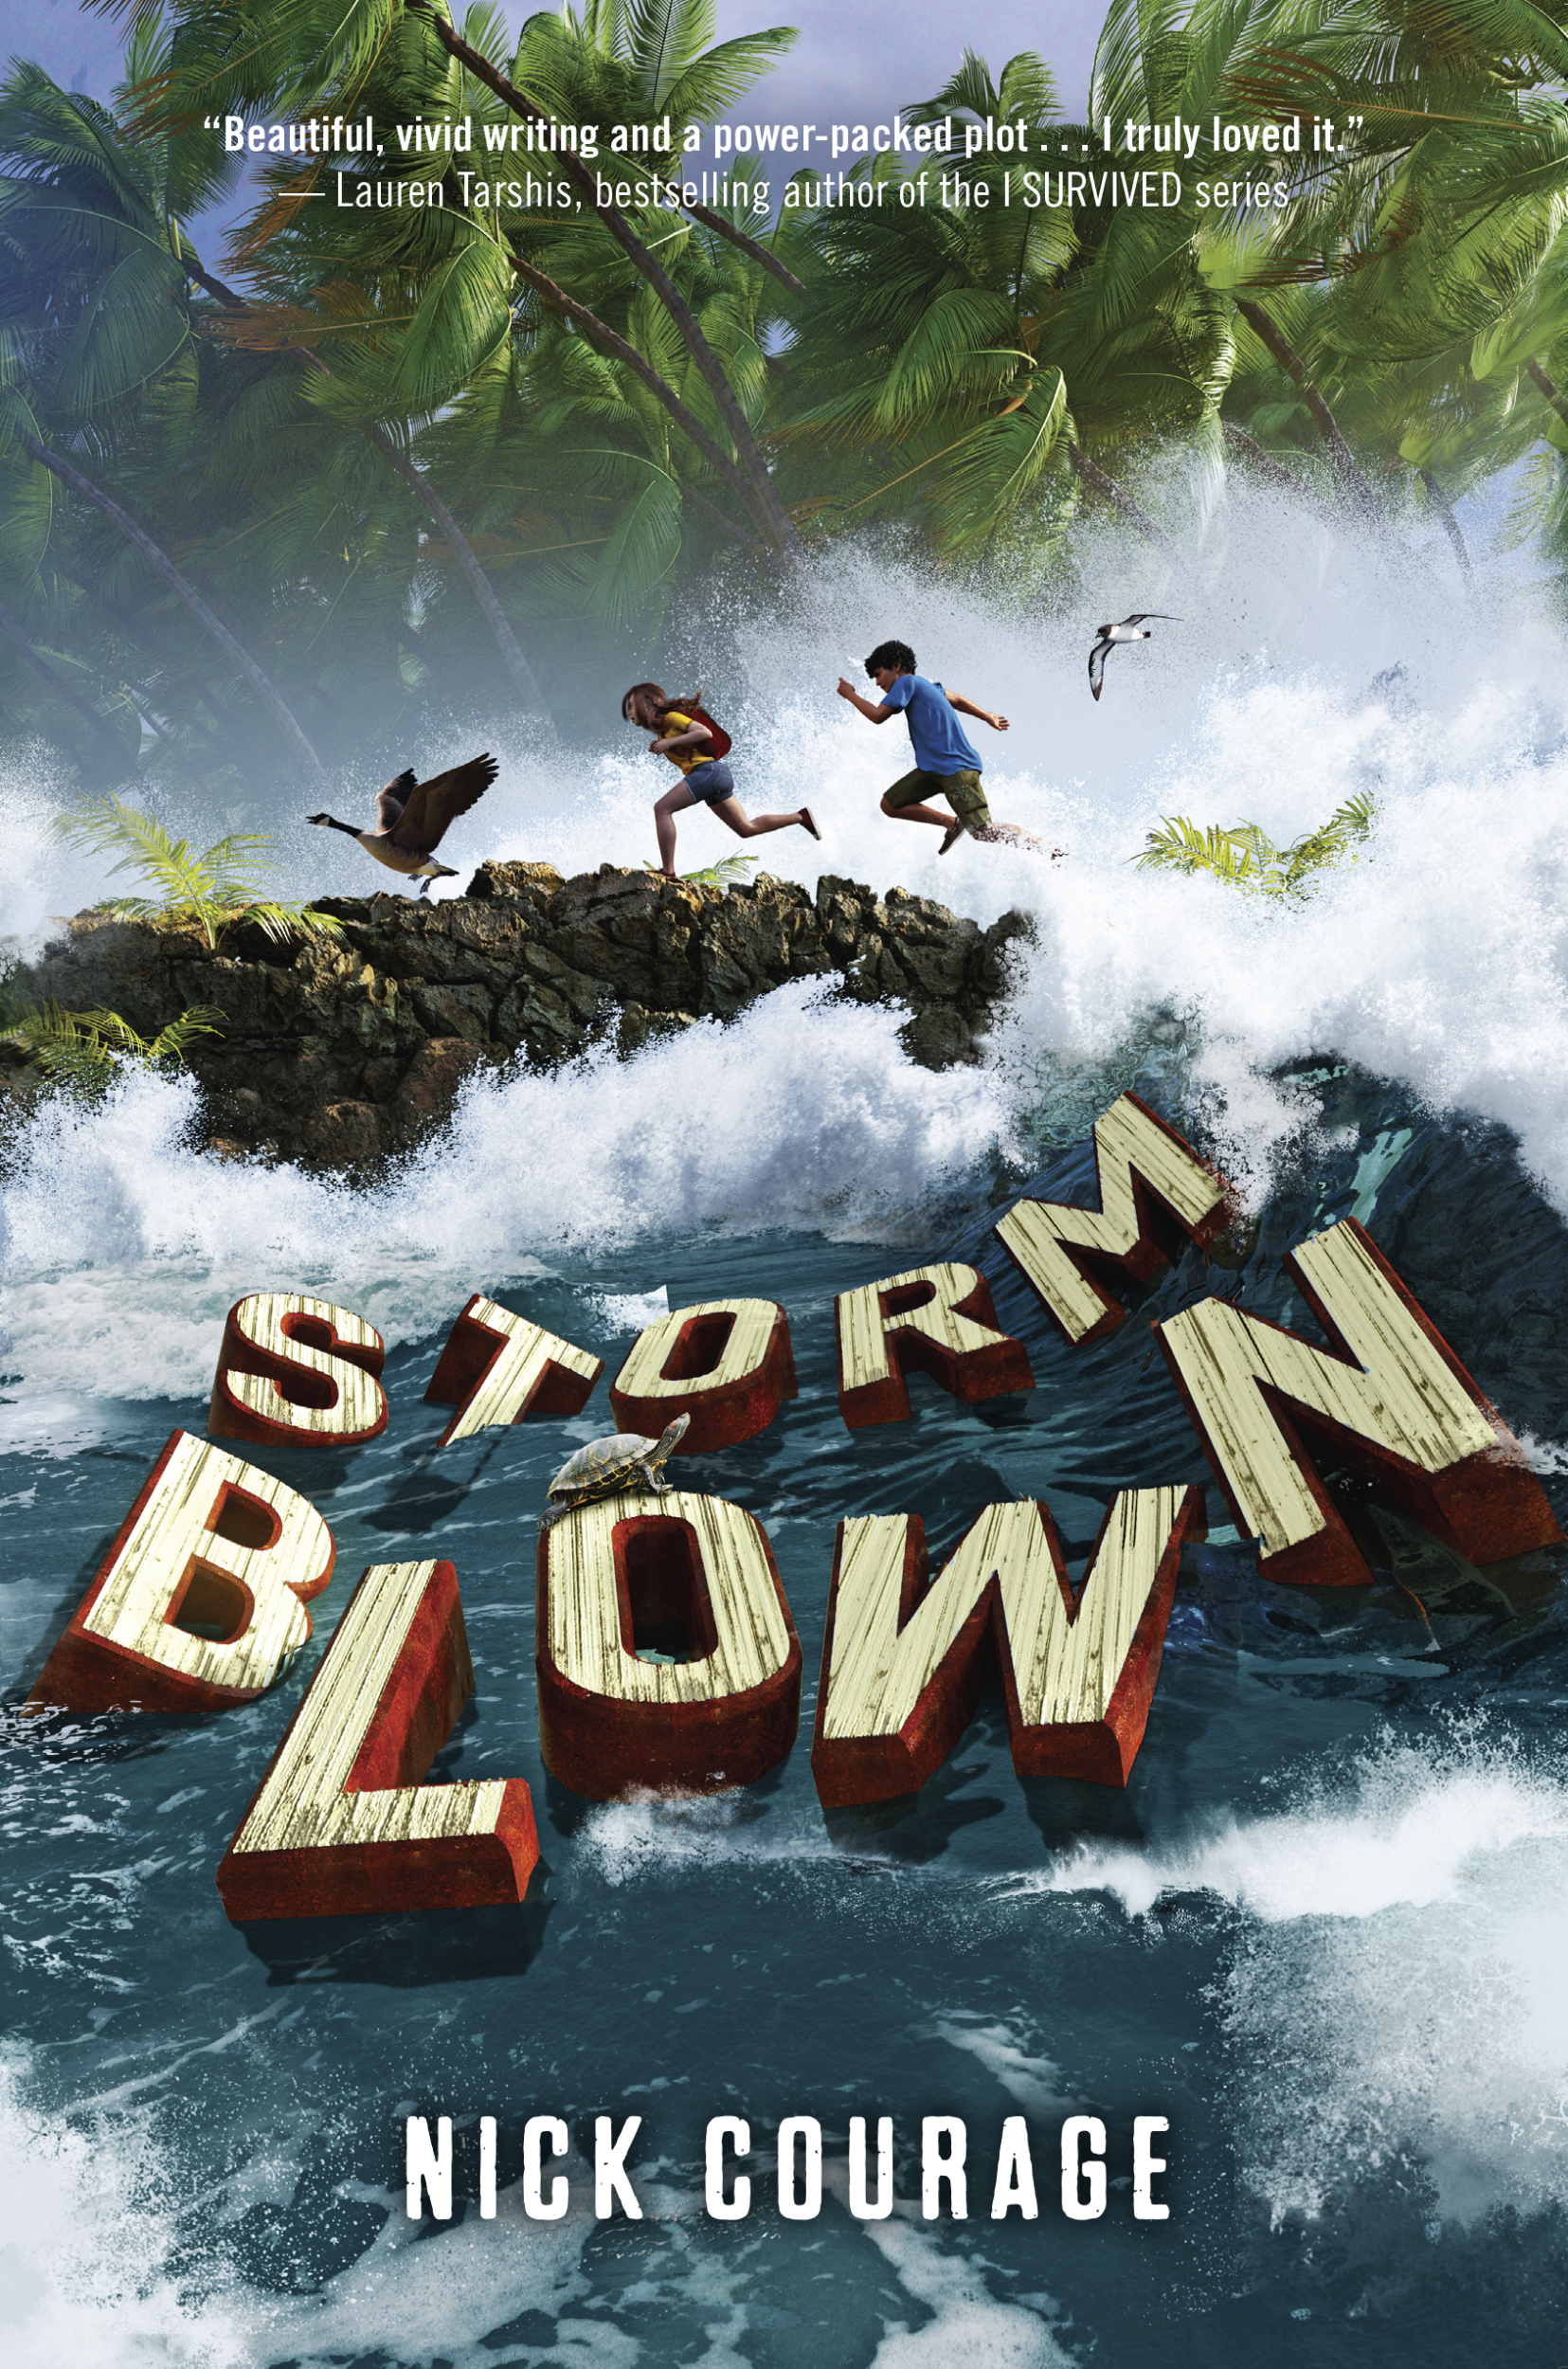 StormBlown-NickCourage-1655x2500.png